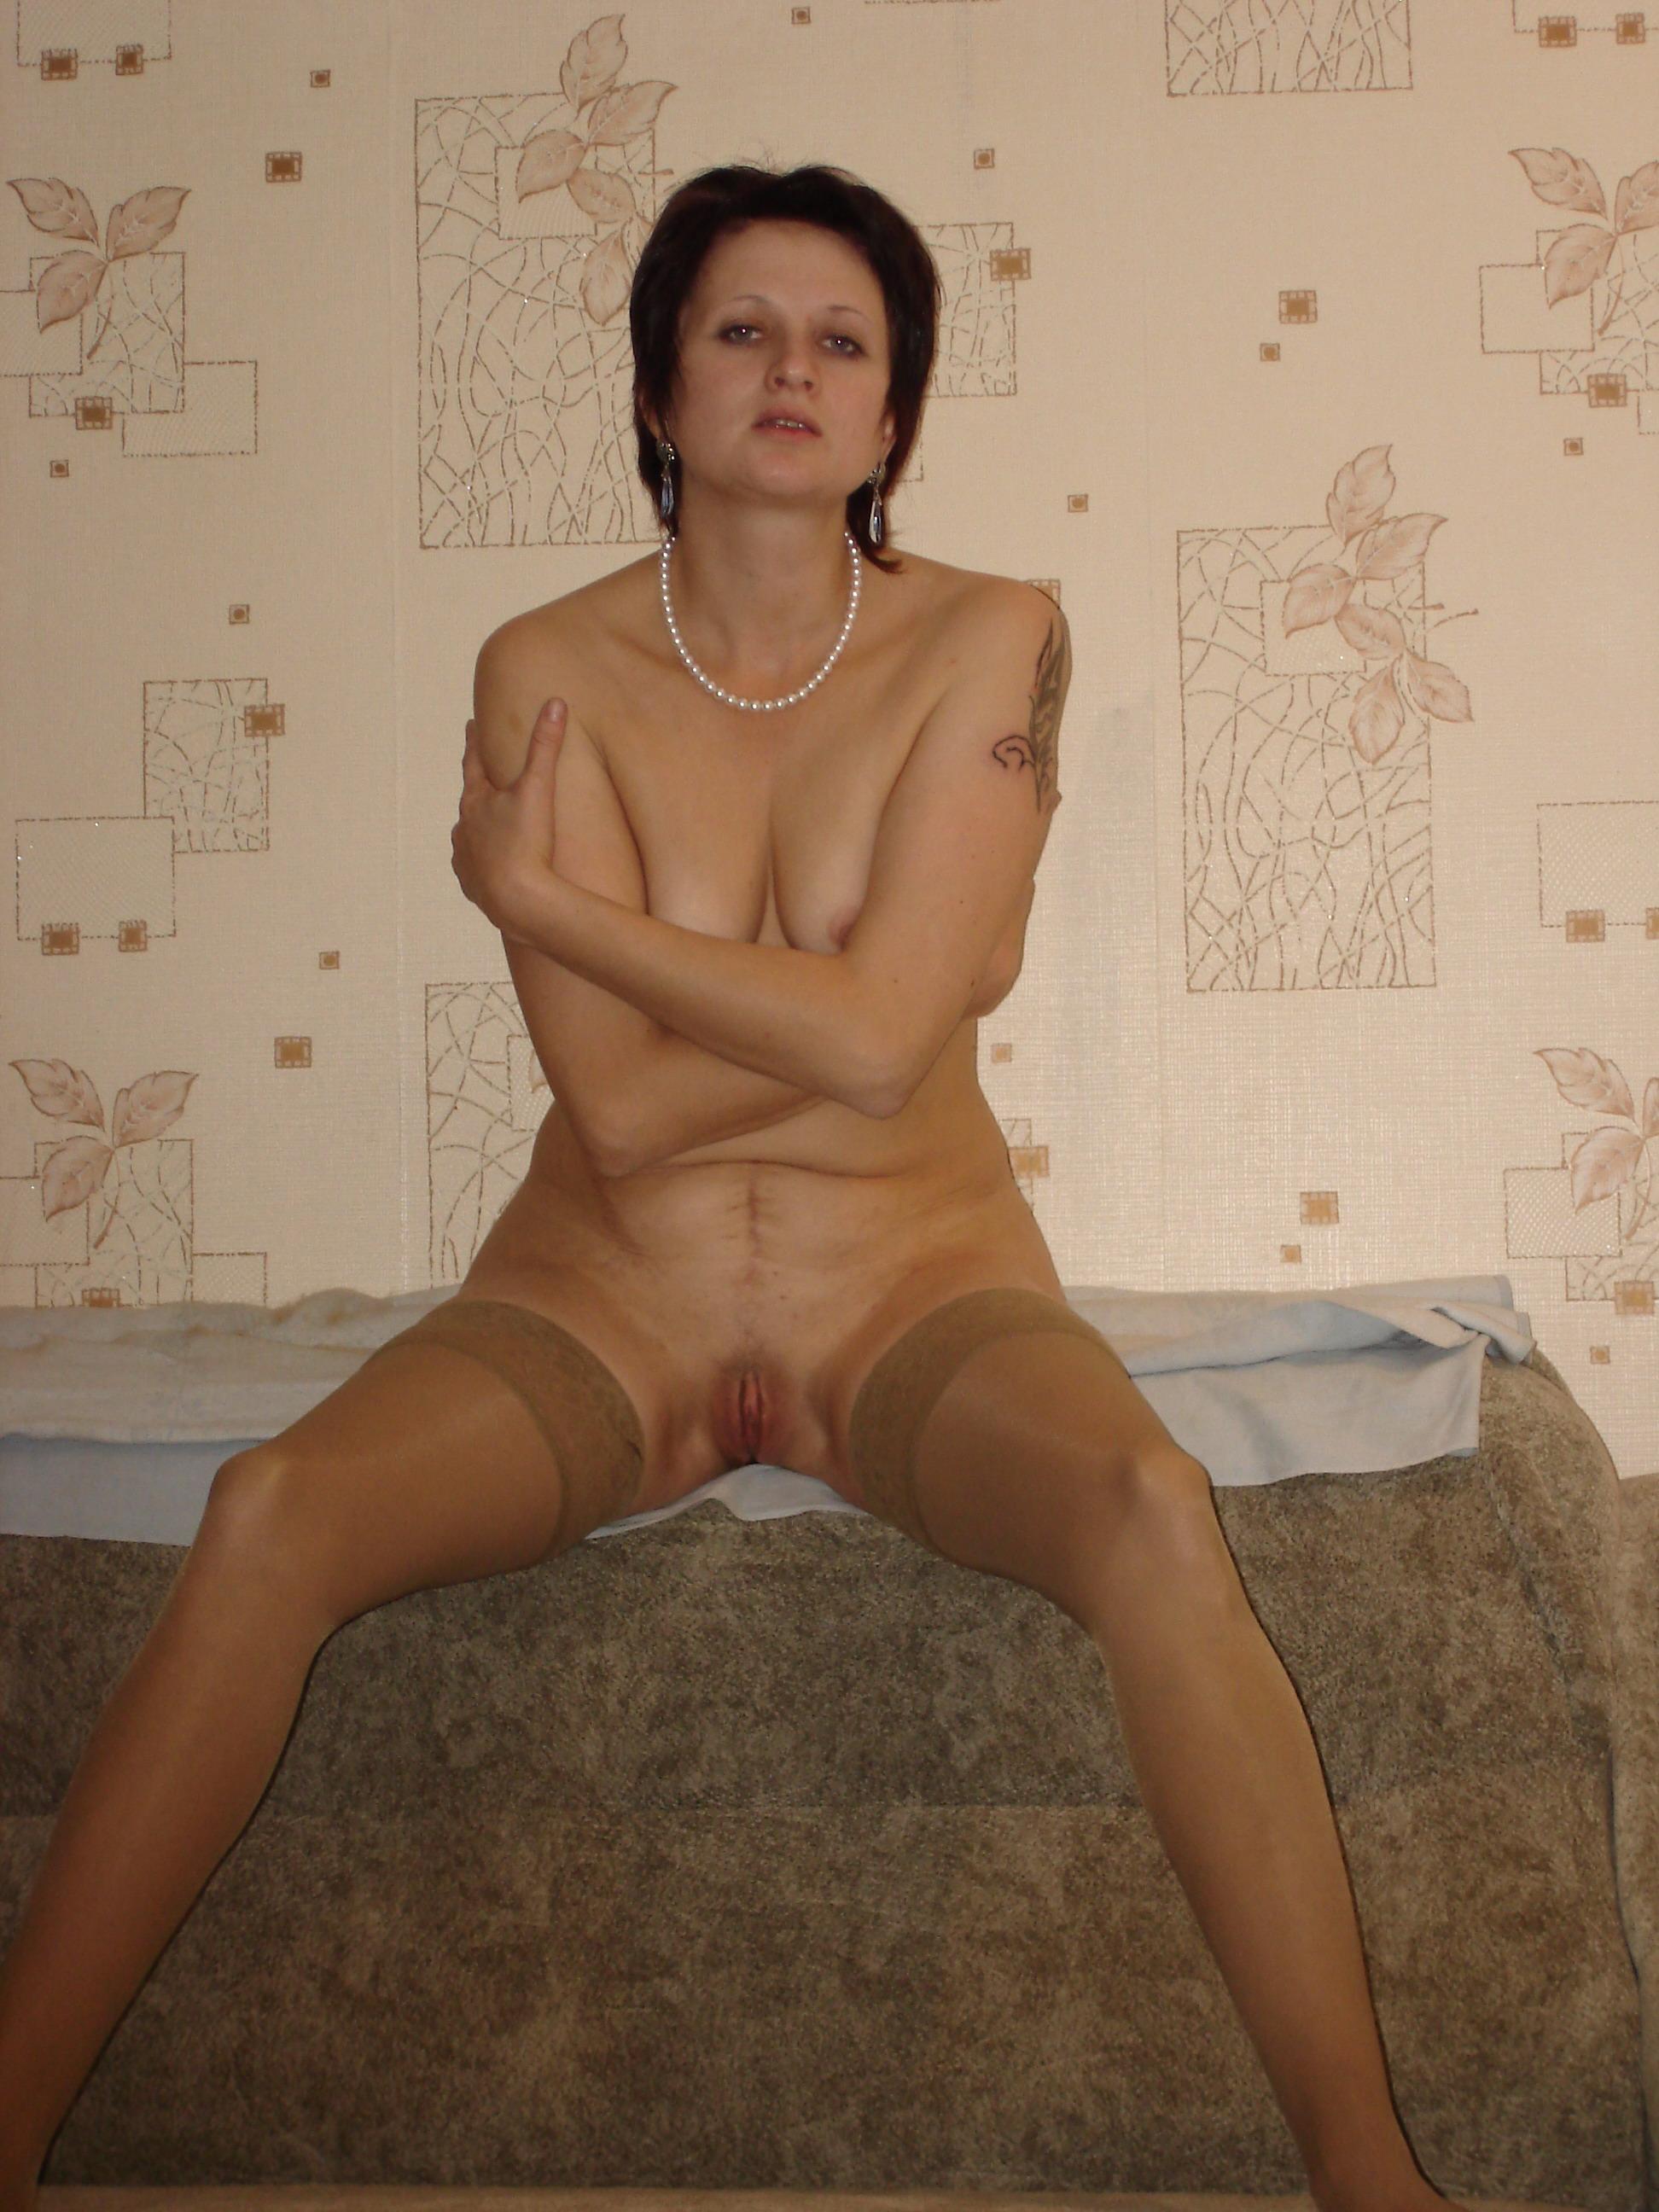 Проститутки г лангепаса метро бабушкино проститутки